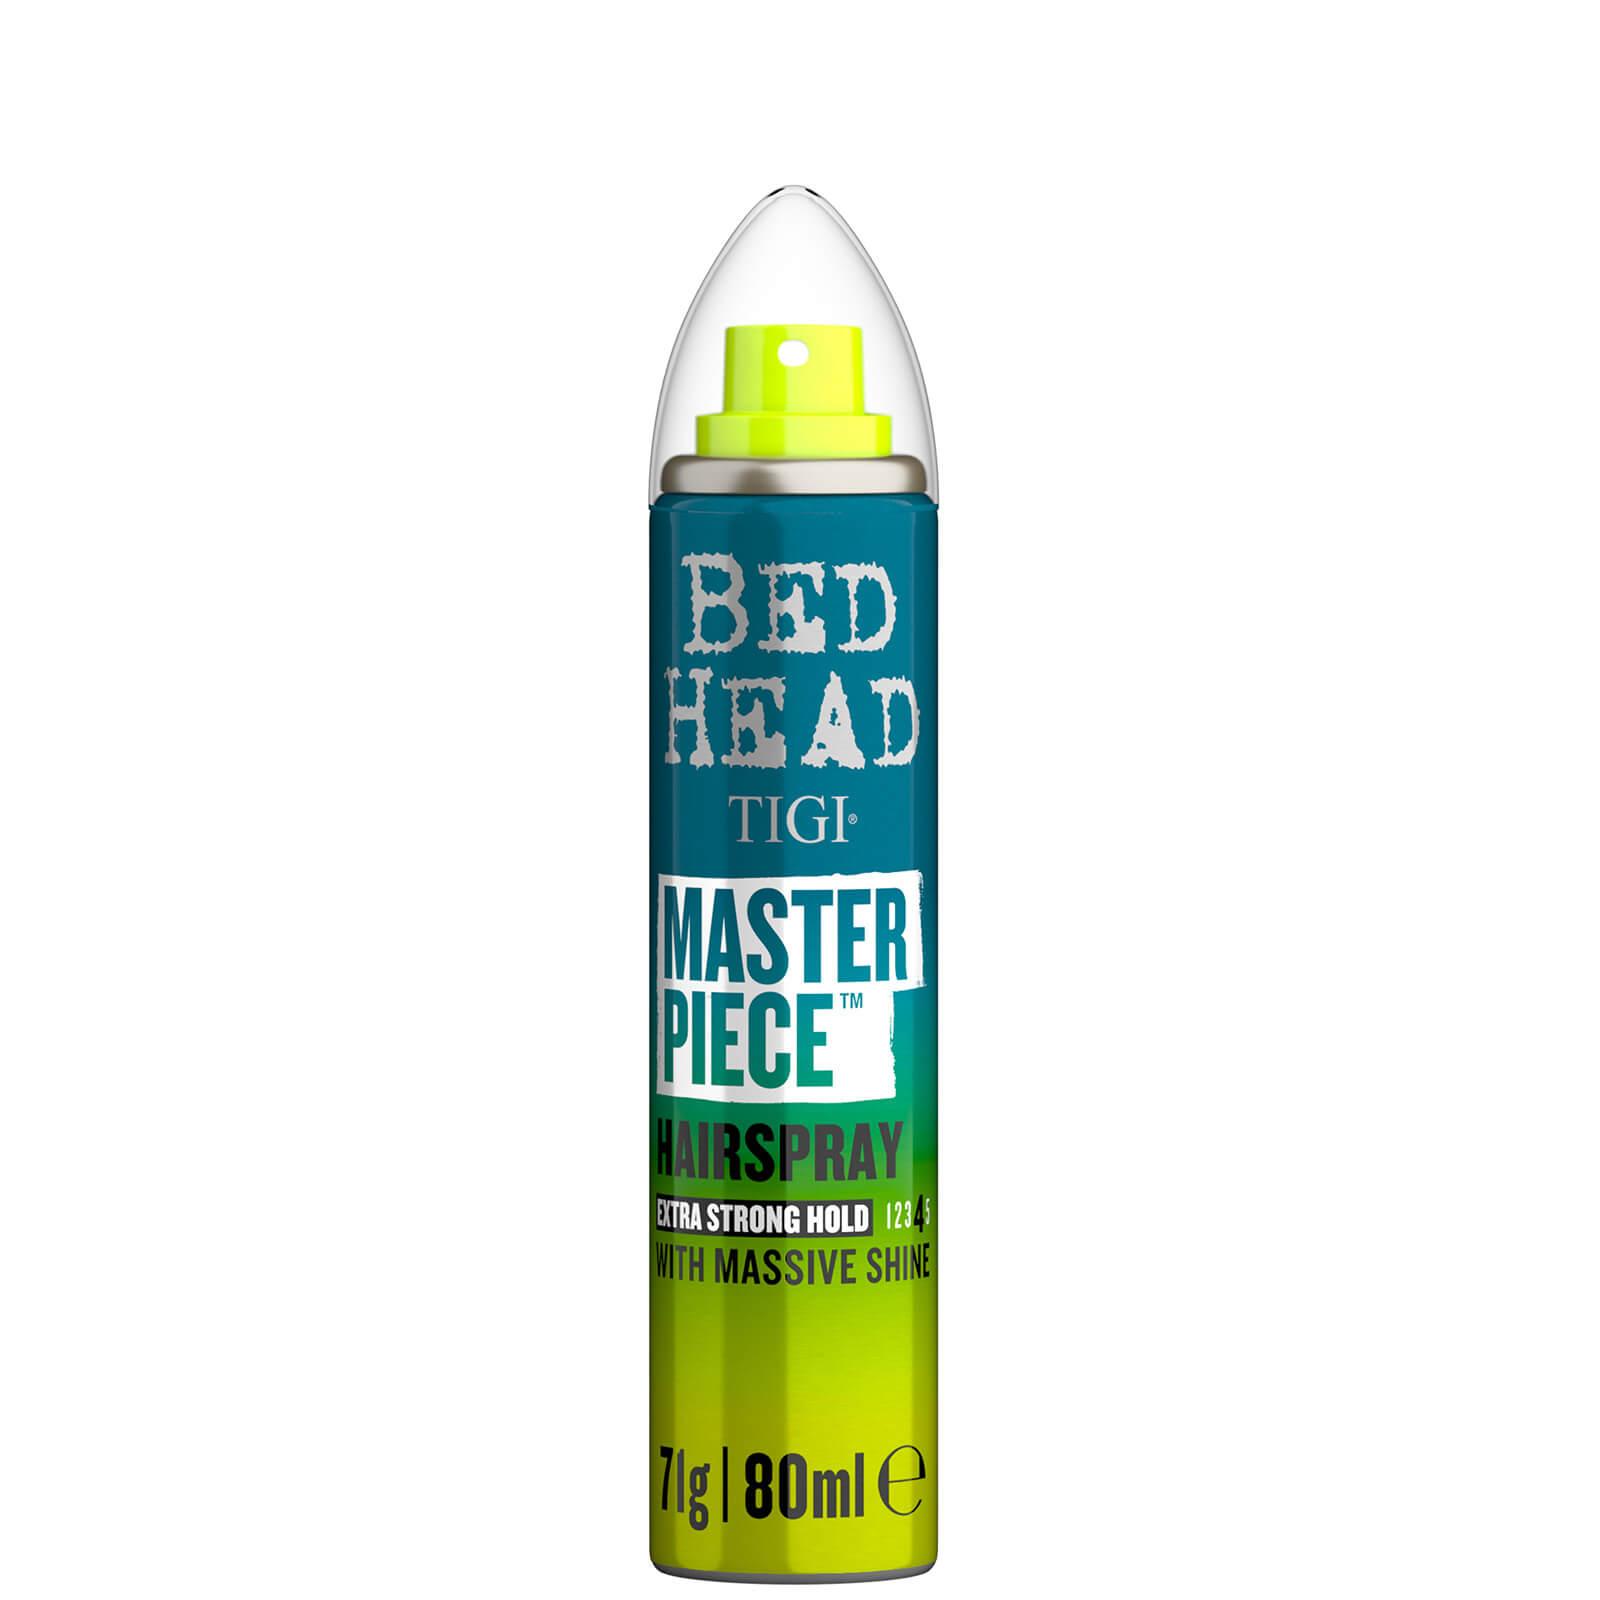 Купить TIGI Bed Head Masterpiece Shiny Hairspray for Strong Hold Travel Size 80ml